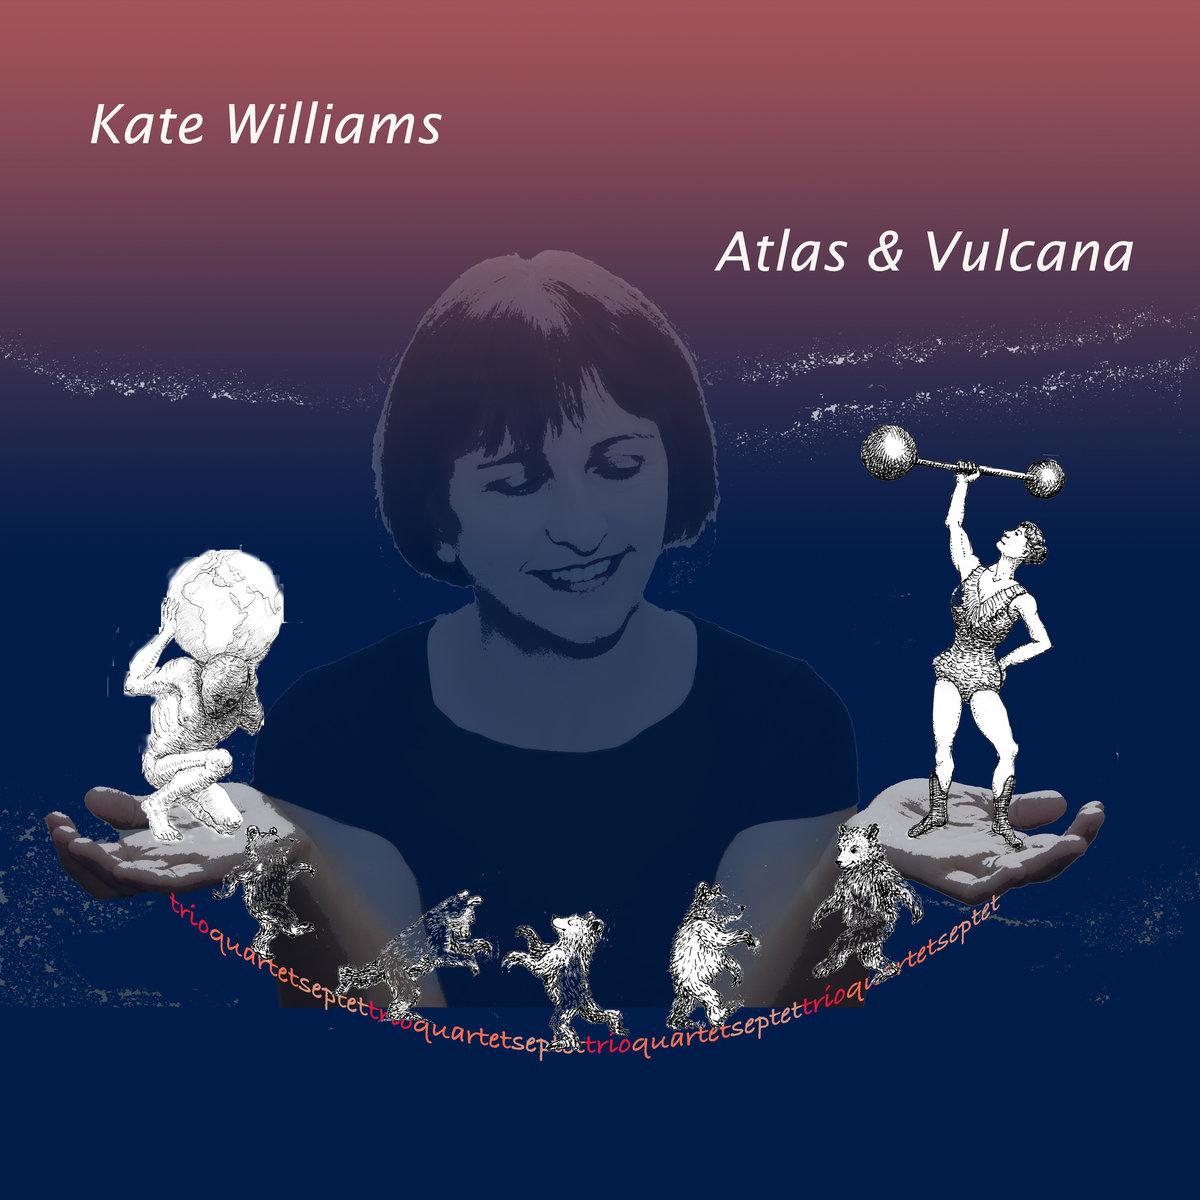 Kate Williams - Atlas and Vulcana